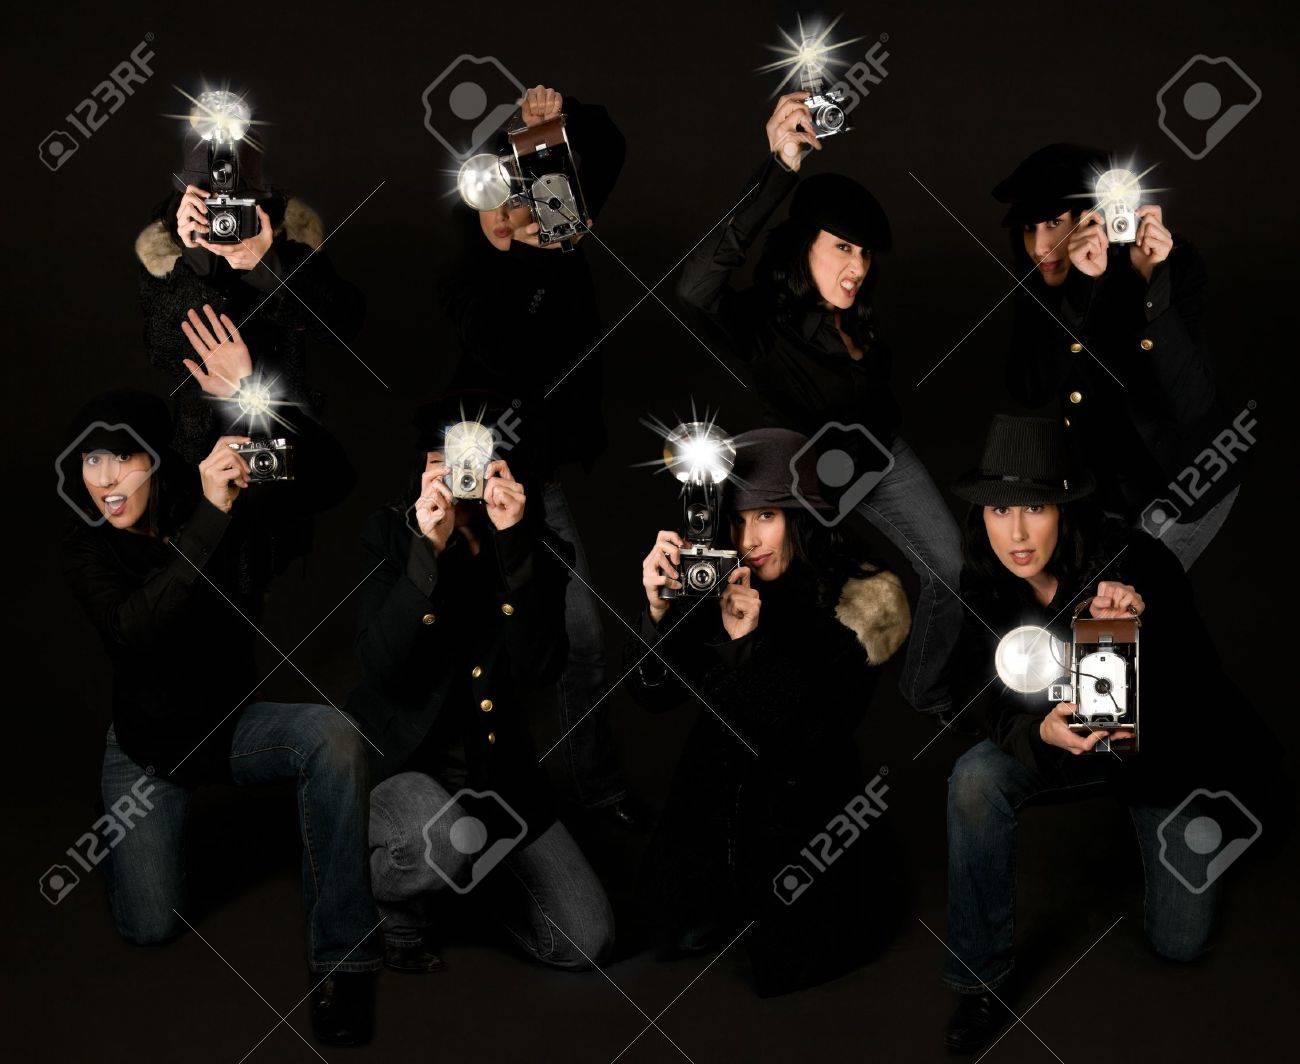 Retro style female paparazzi press photographers with vintage cameras Stock Photo - 3937504